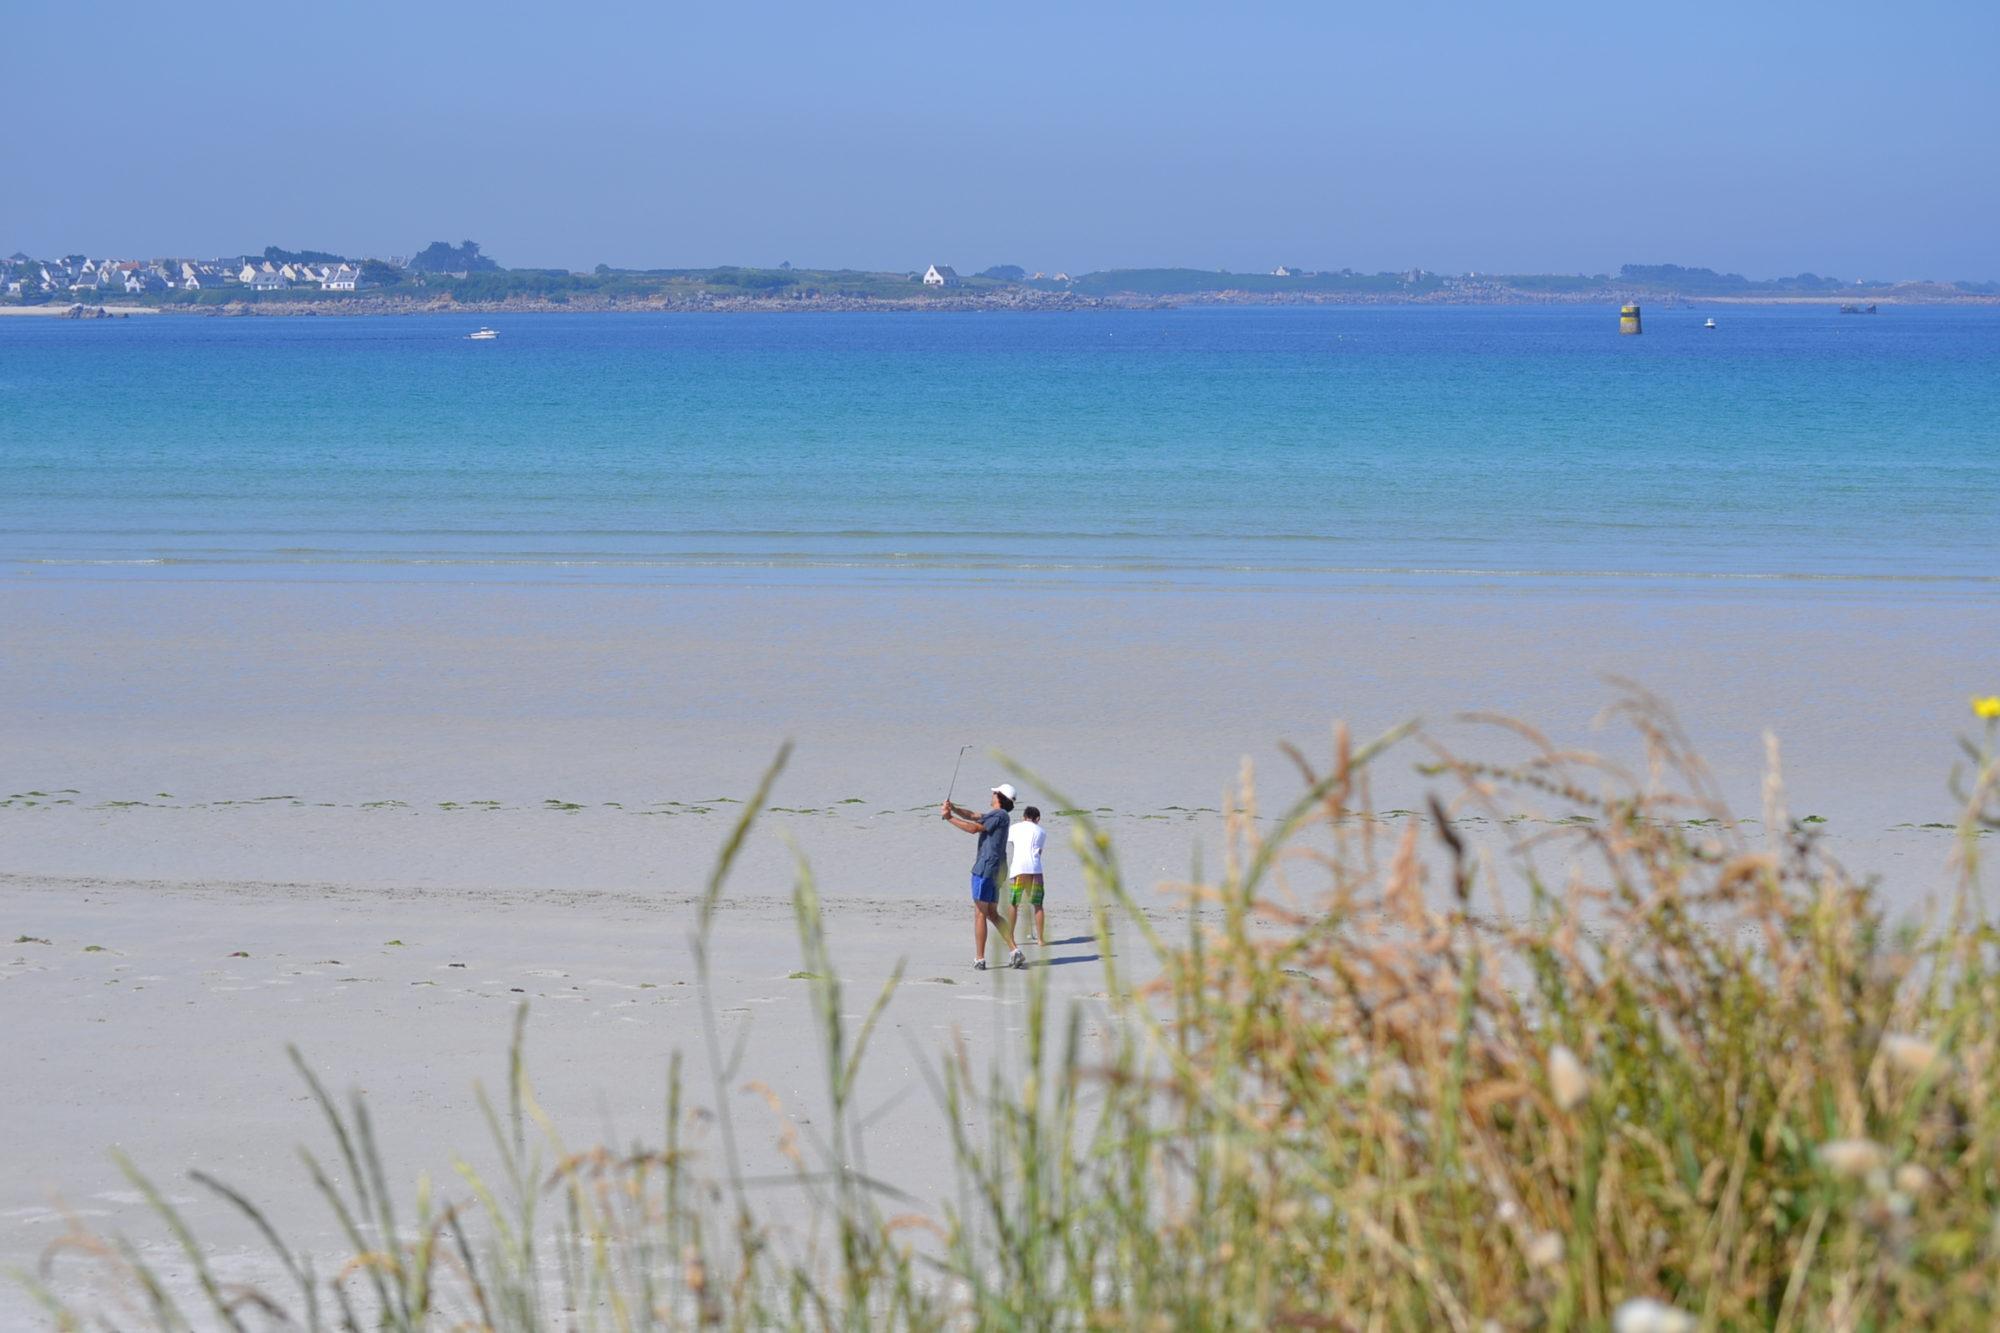 plage vacances location Bretagne